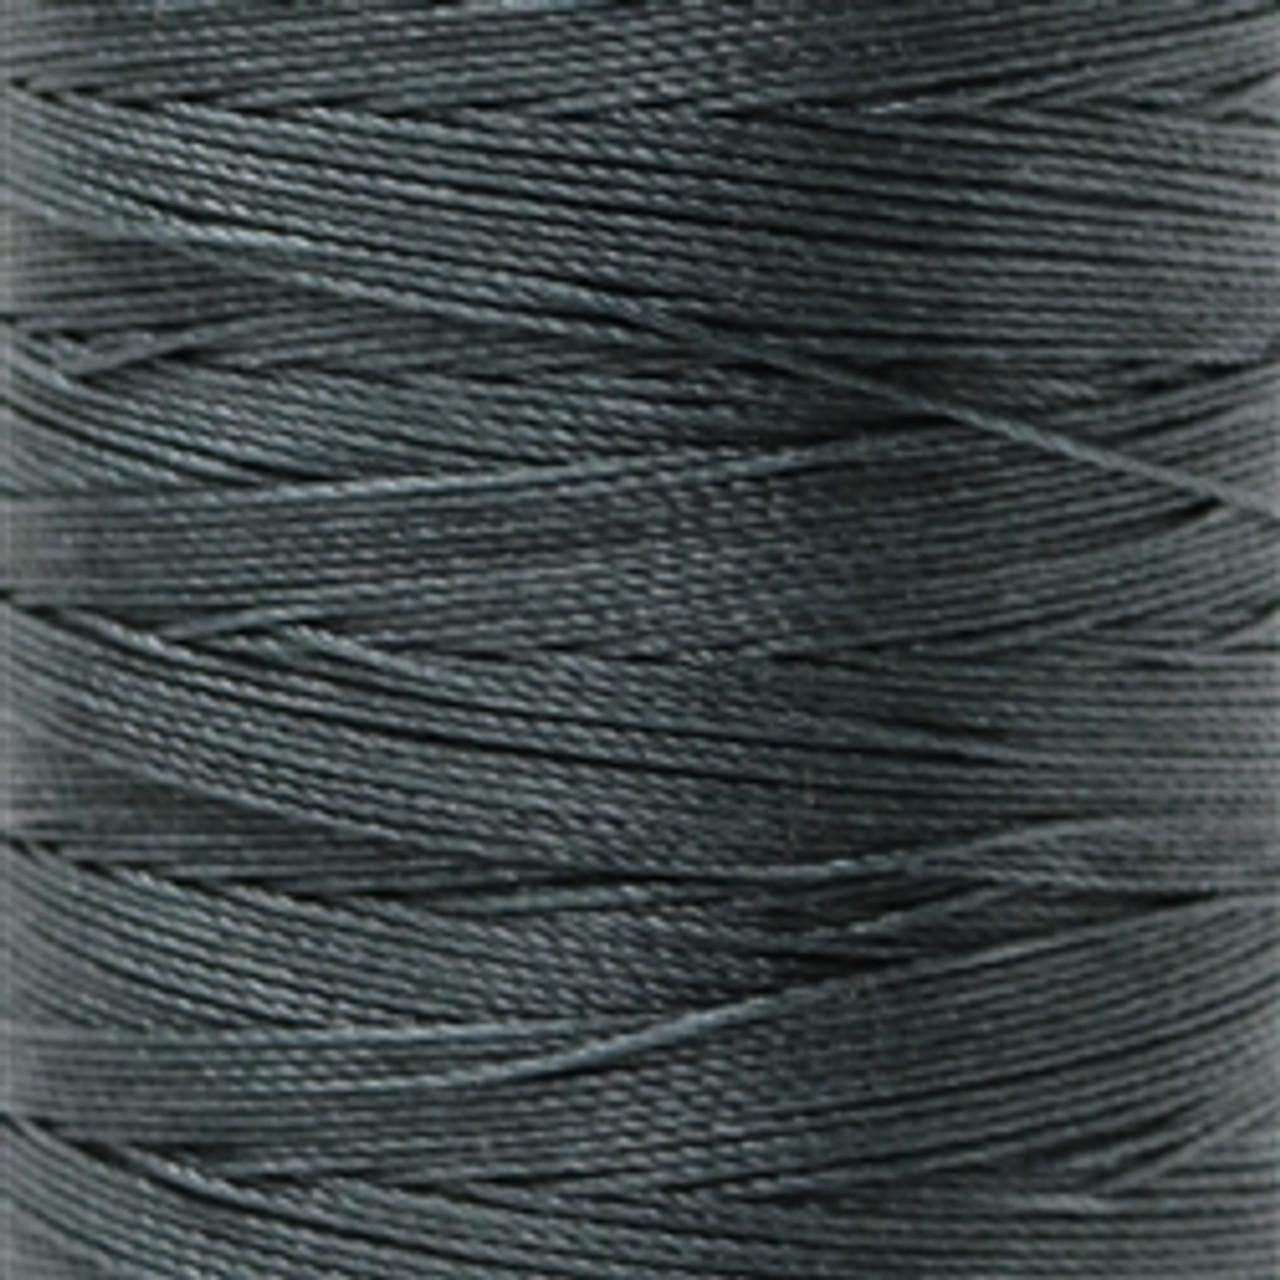 QTC T-270 Bonded Nylon Thread Dark Dray  706Q 8 oz Spool